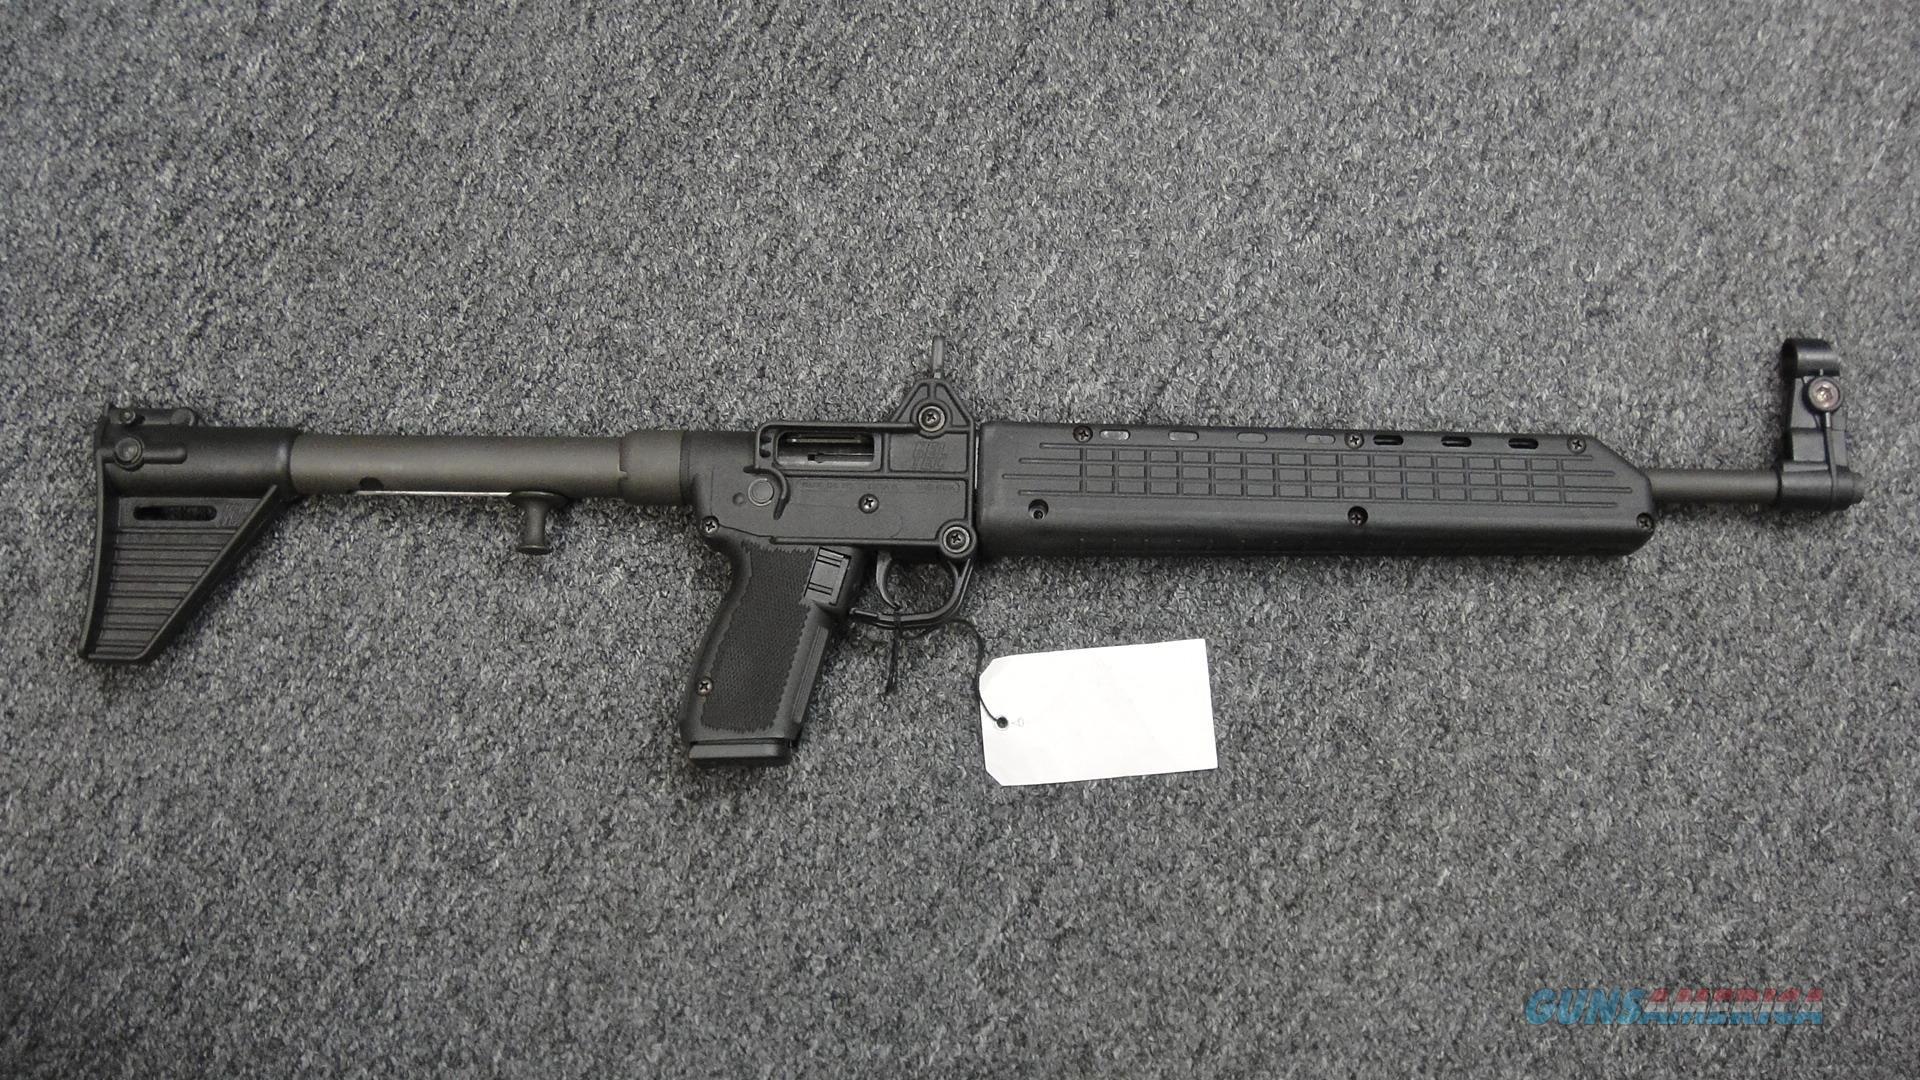 Kel-Tec Sub2000 .40S&W Gen 1 (Glock 22 mag)  Guns > Rifles > Kel-Tec Rifles